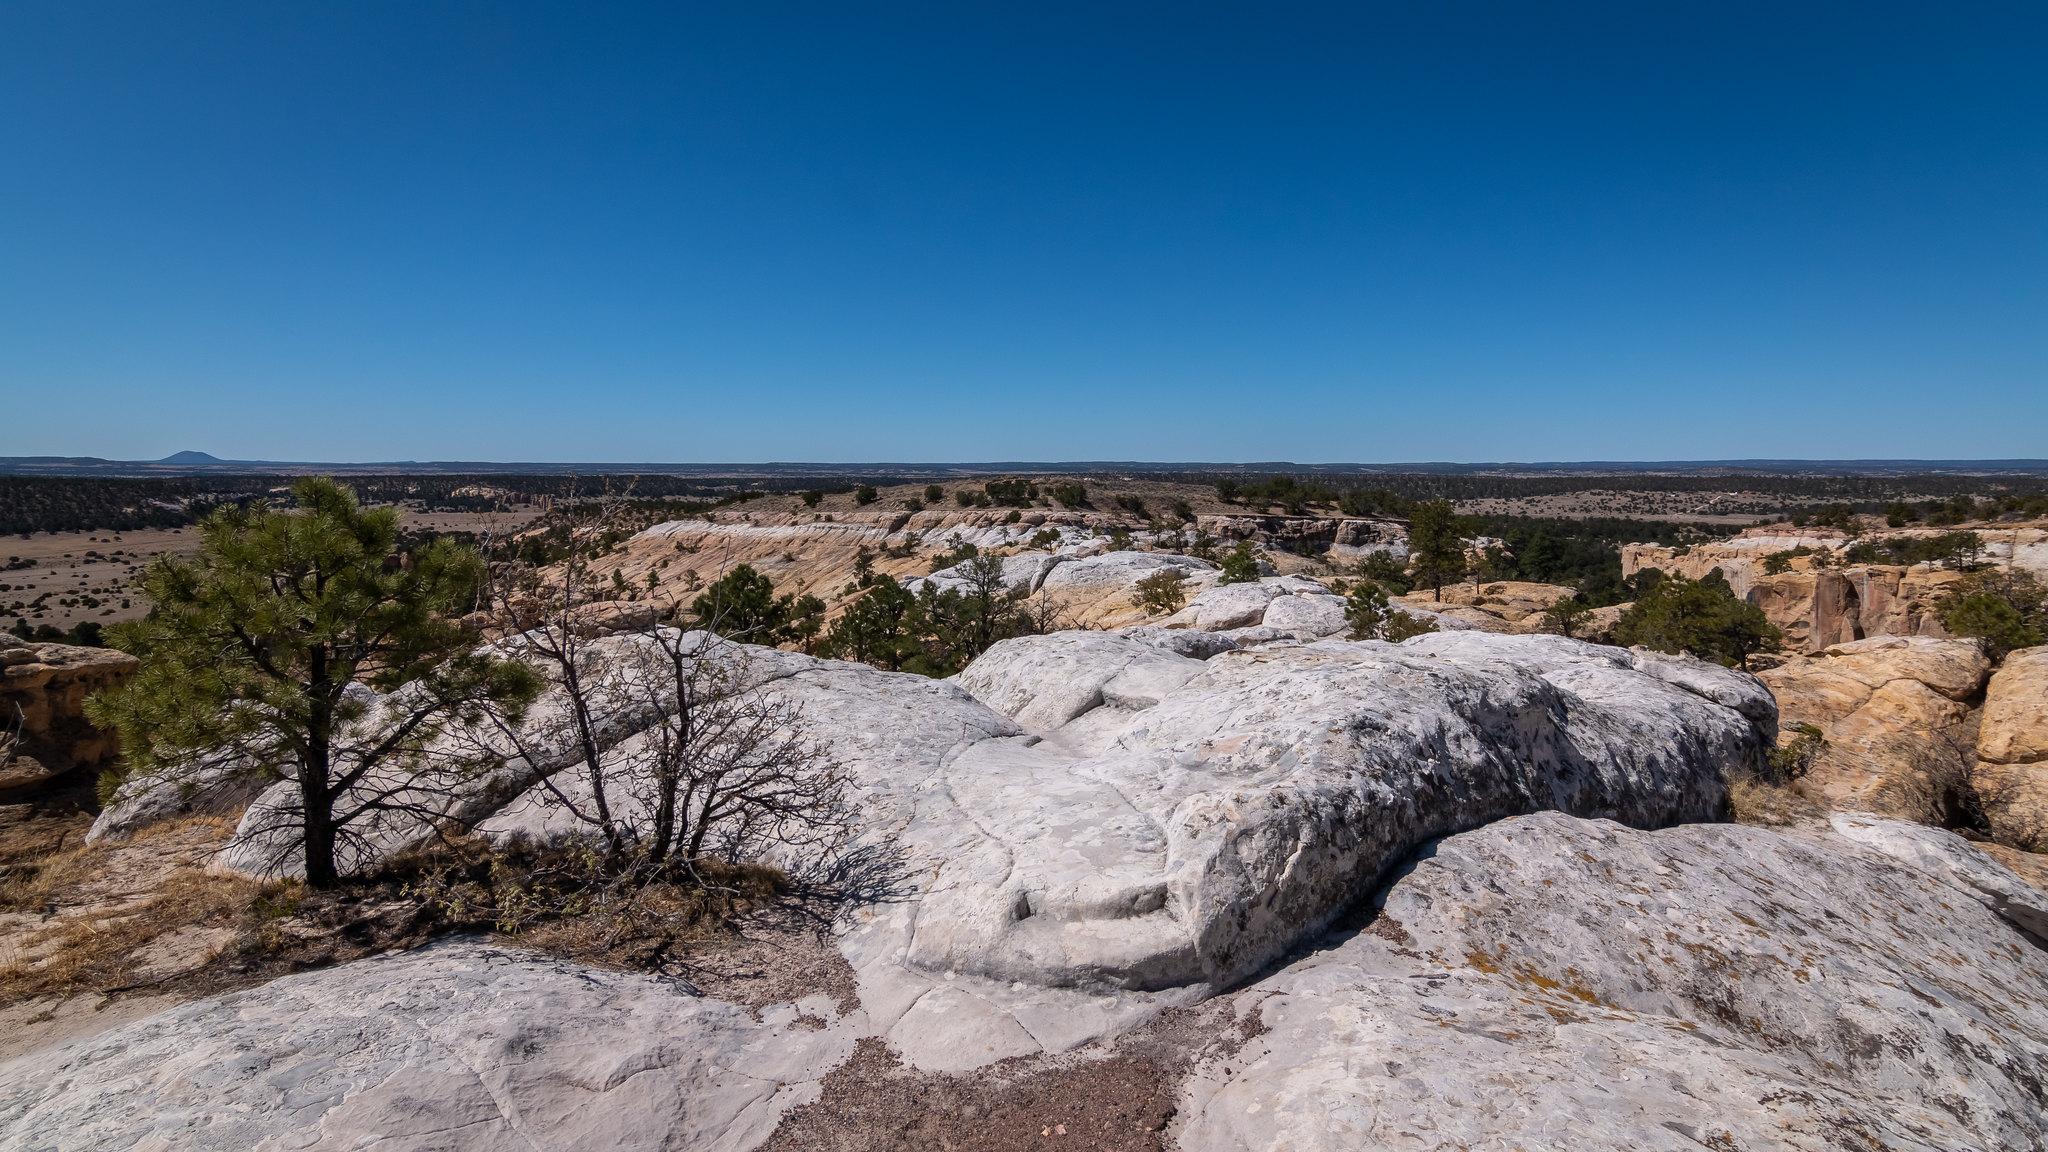 El Morro - Nouveau-Mexique - [USA]